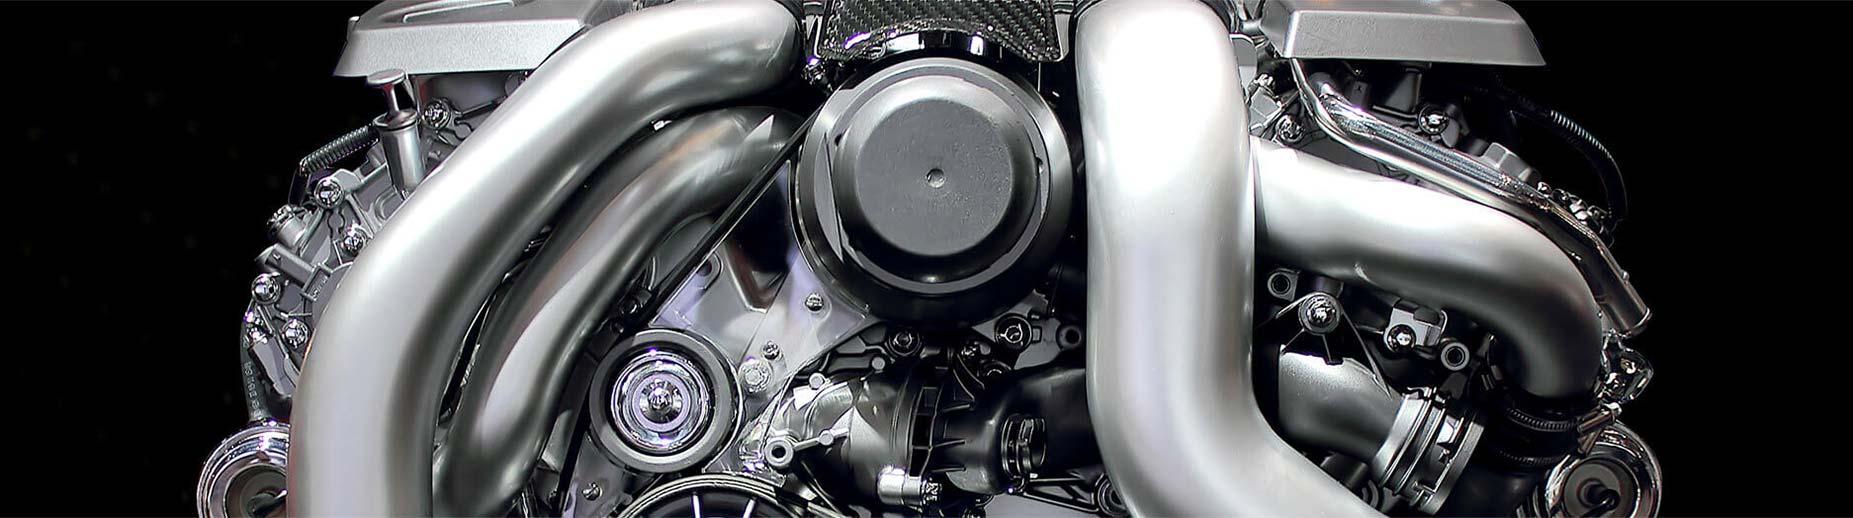 Big Spring Auto Repair, Auto Mechanic and Diesel Mechanic